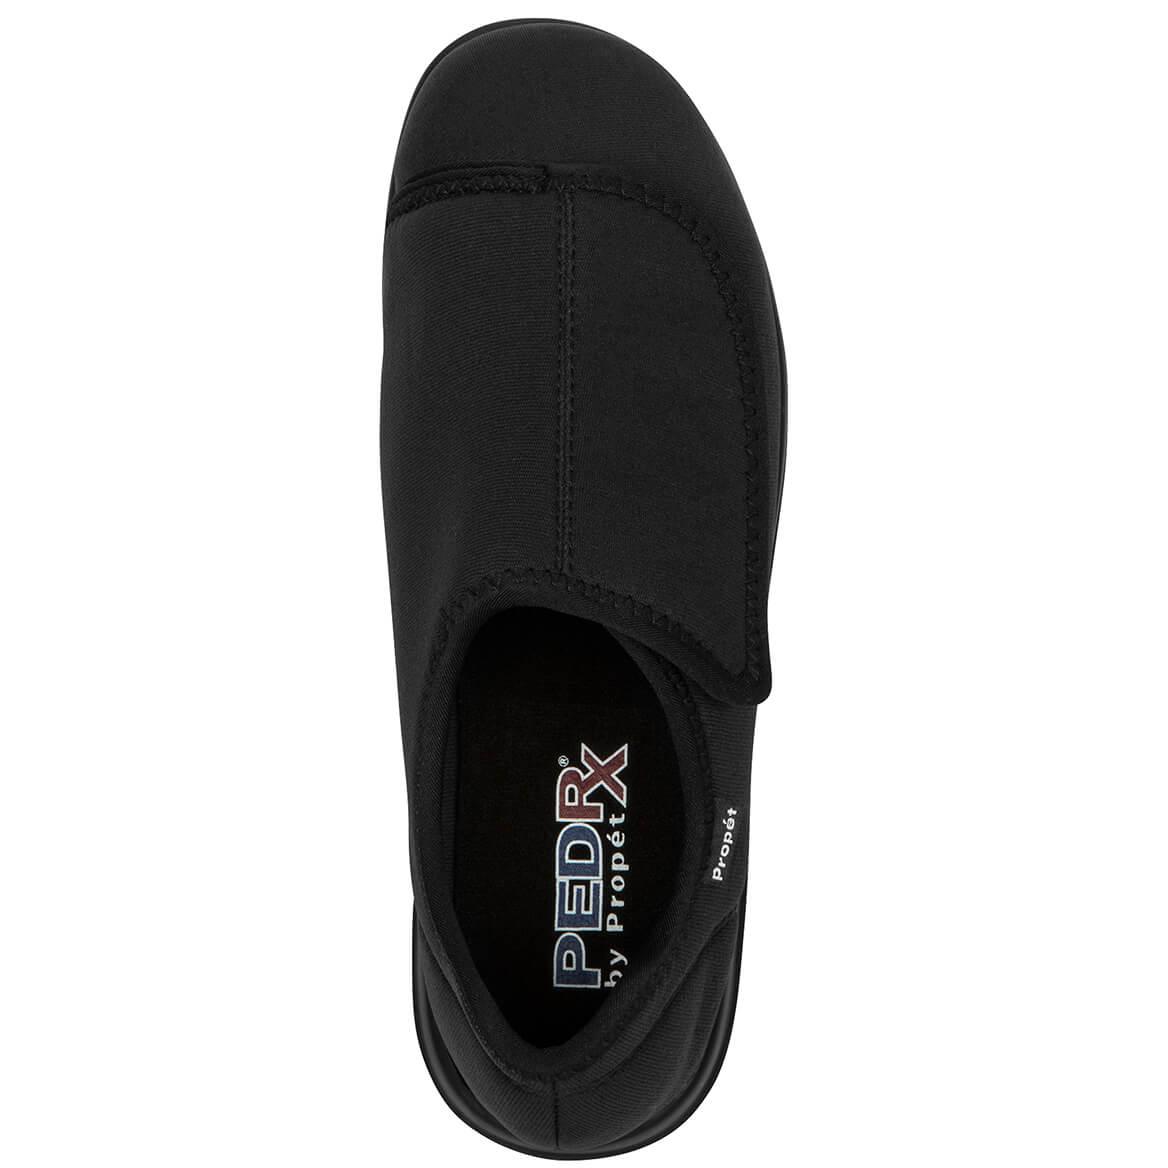 Propet® Cush 'n Foot Women's Slipper - RTV-368356